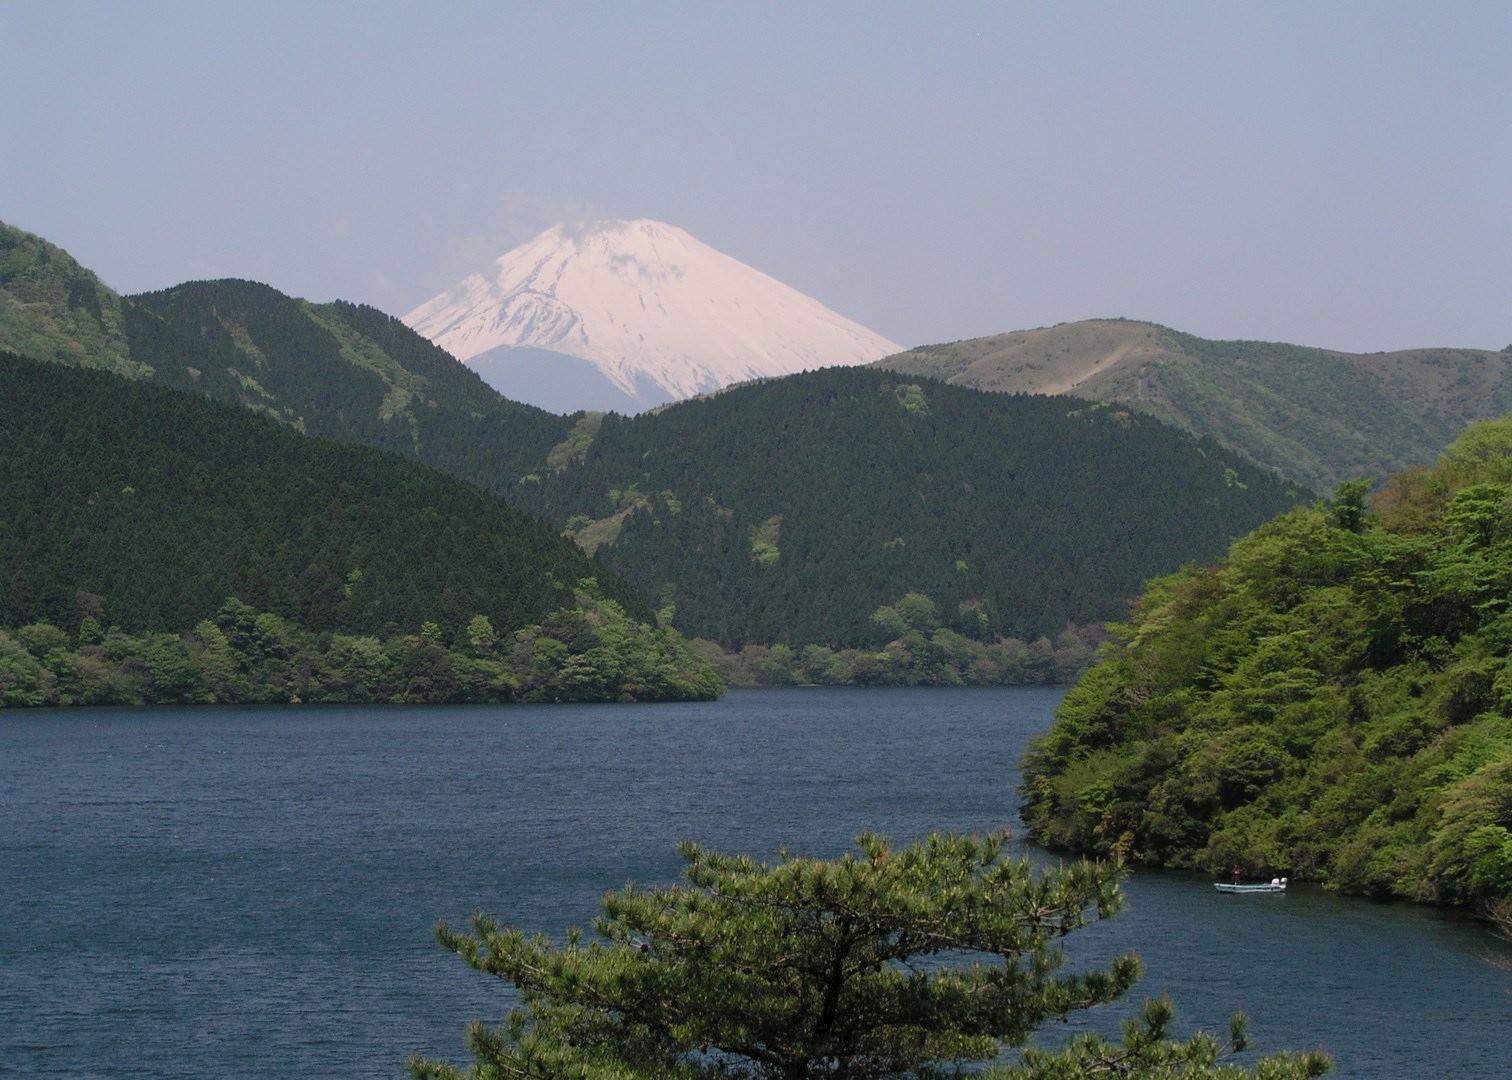 Visit Hakone Amp Mt Fuji On A Trip To Japan Audley Travel